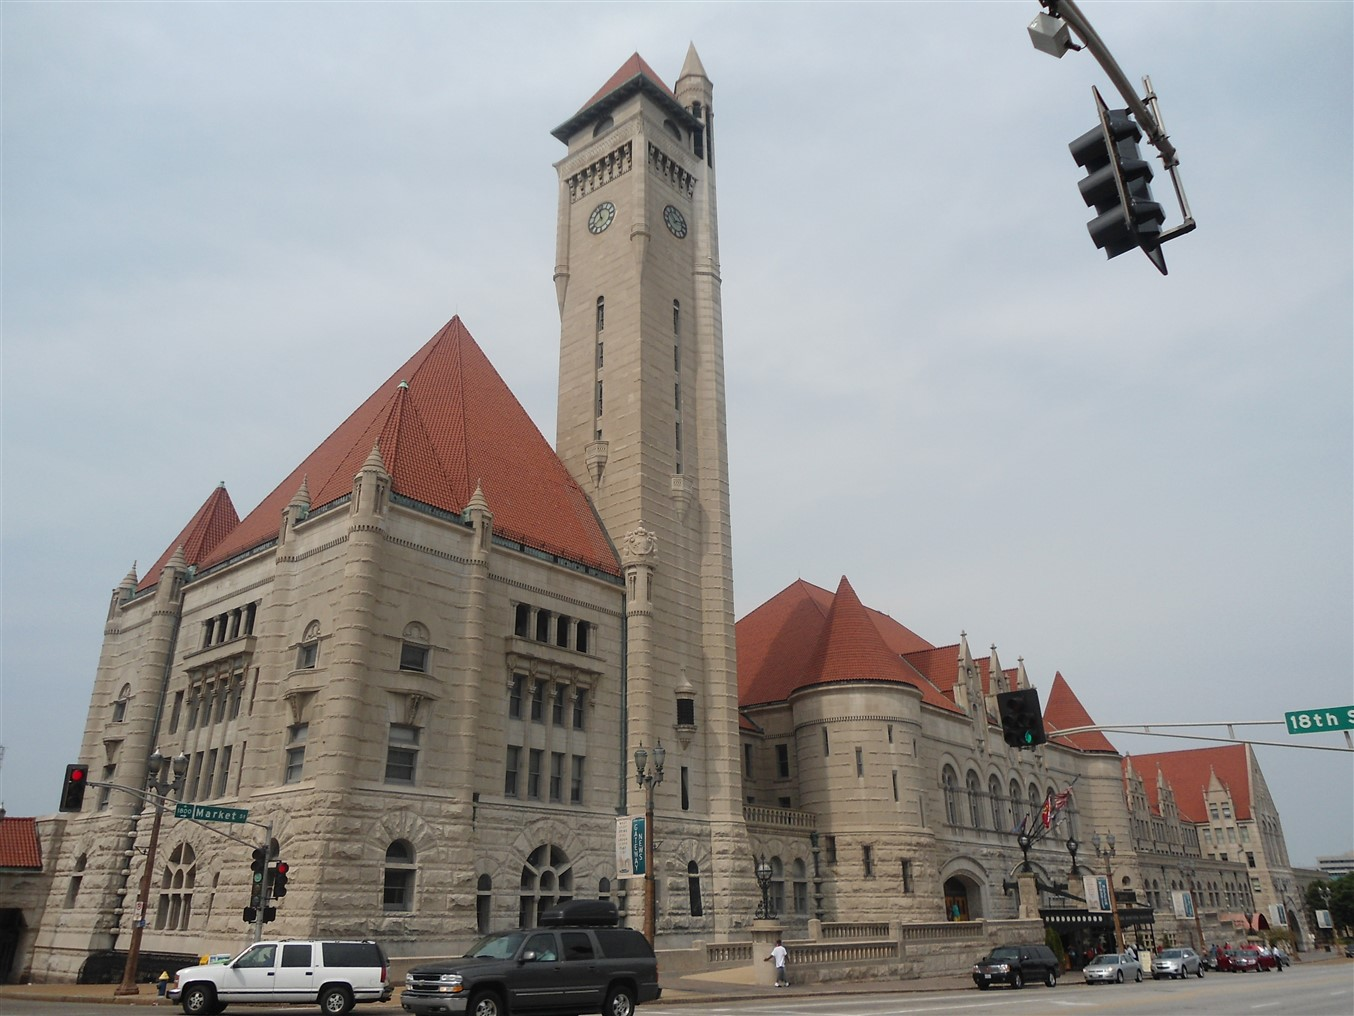 2012 07 01 82 St Louis Union Station.jpg